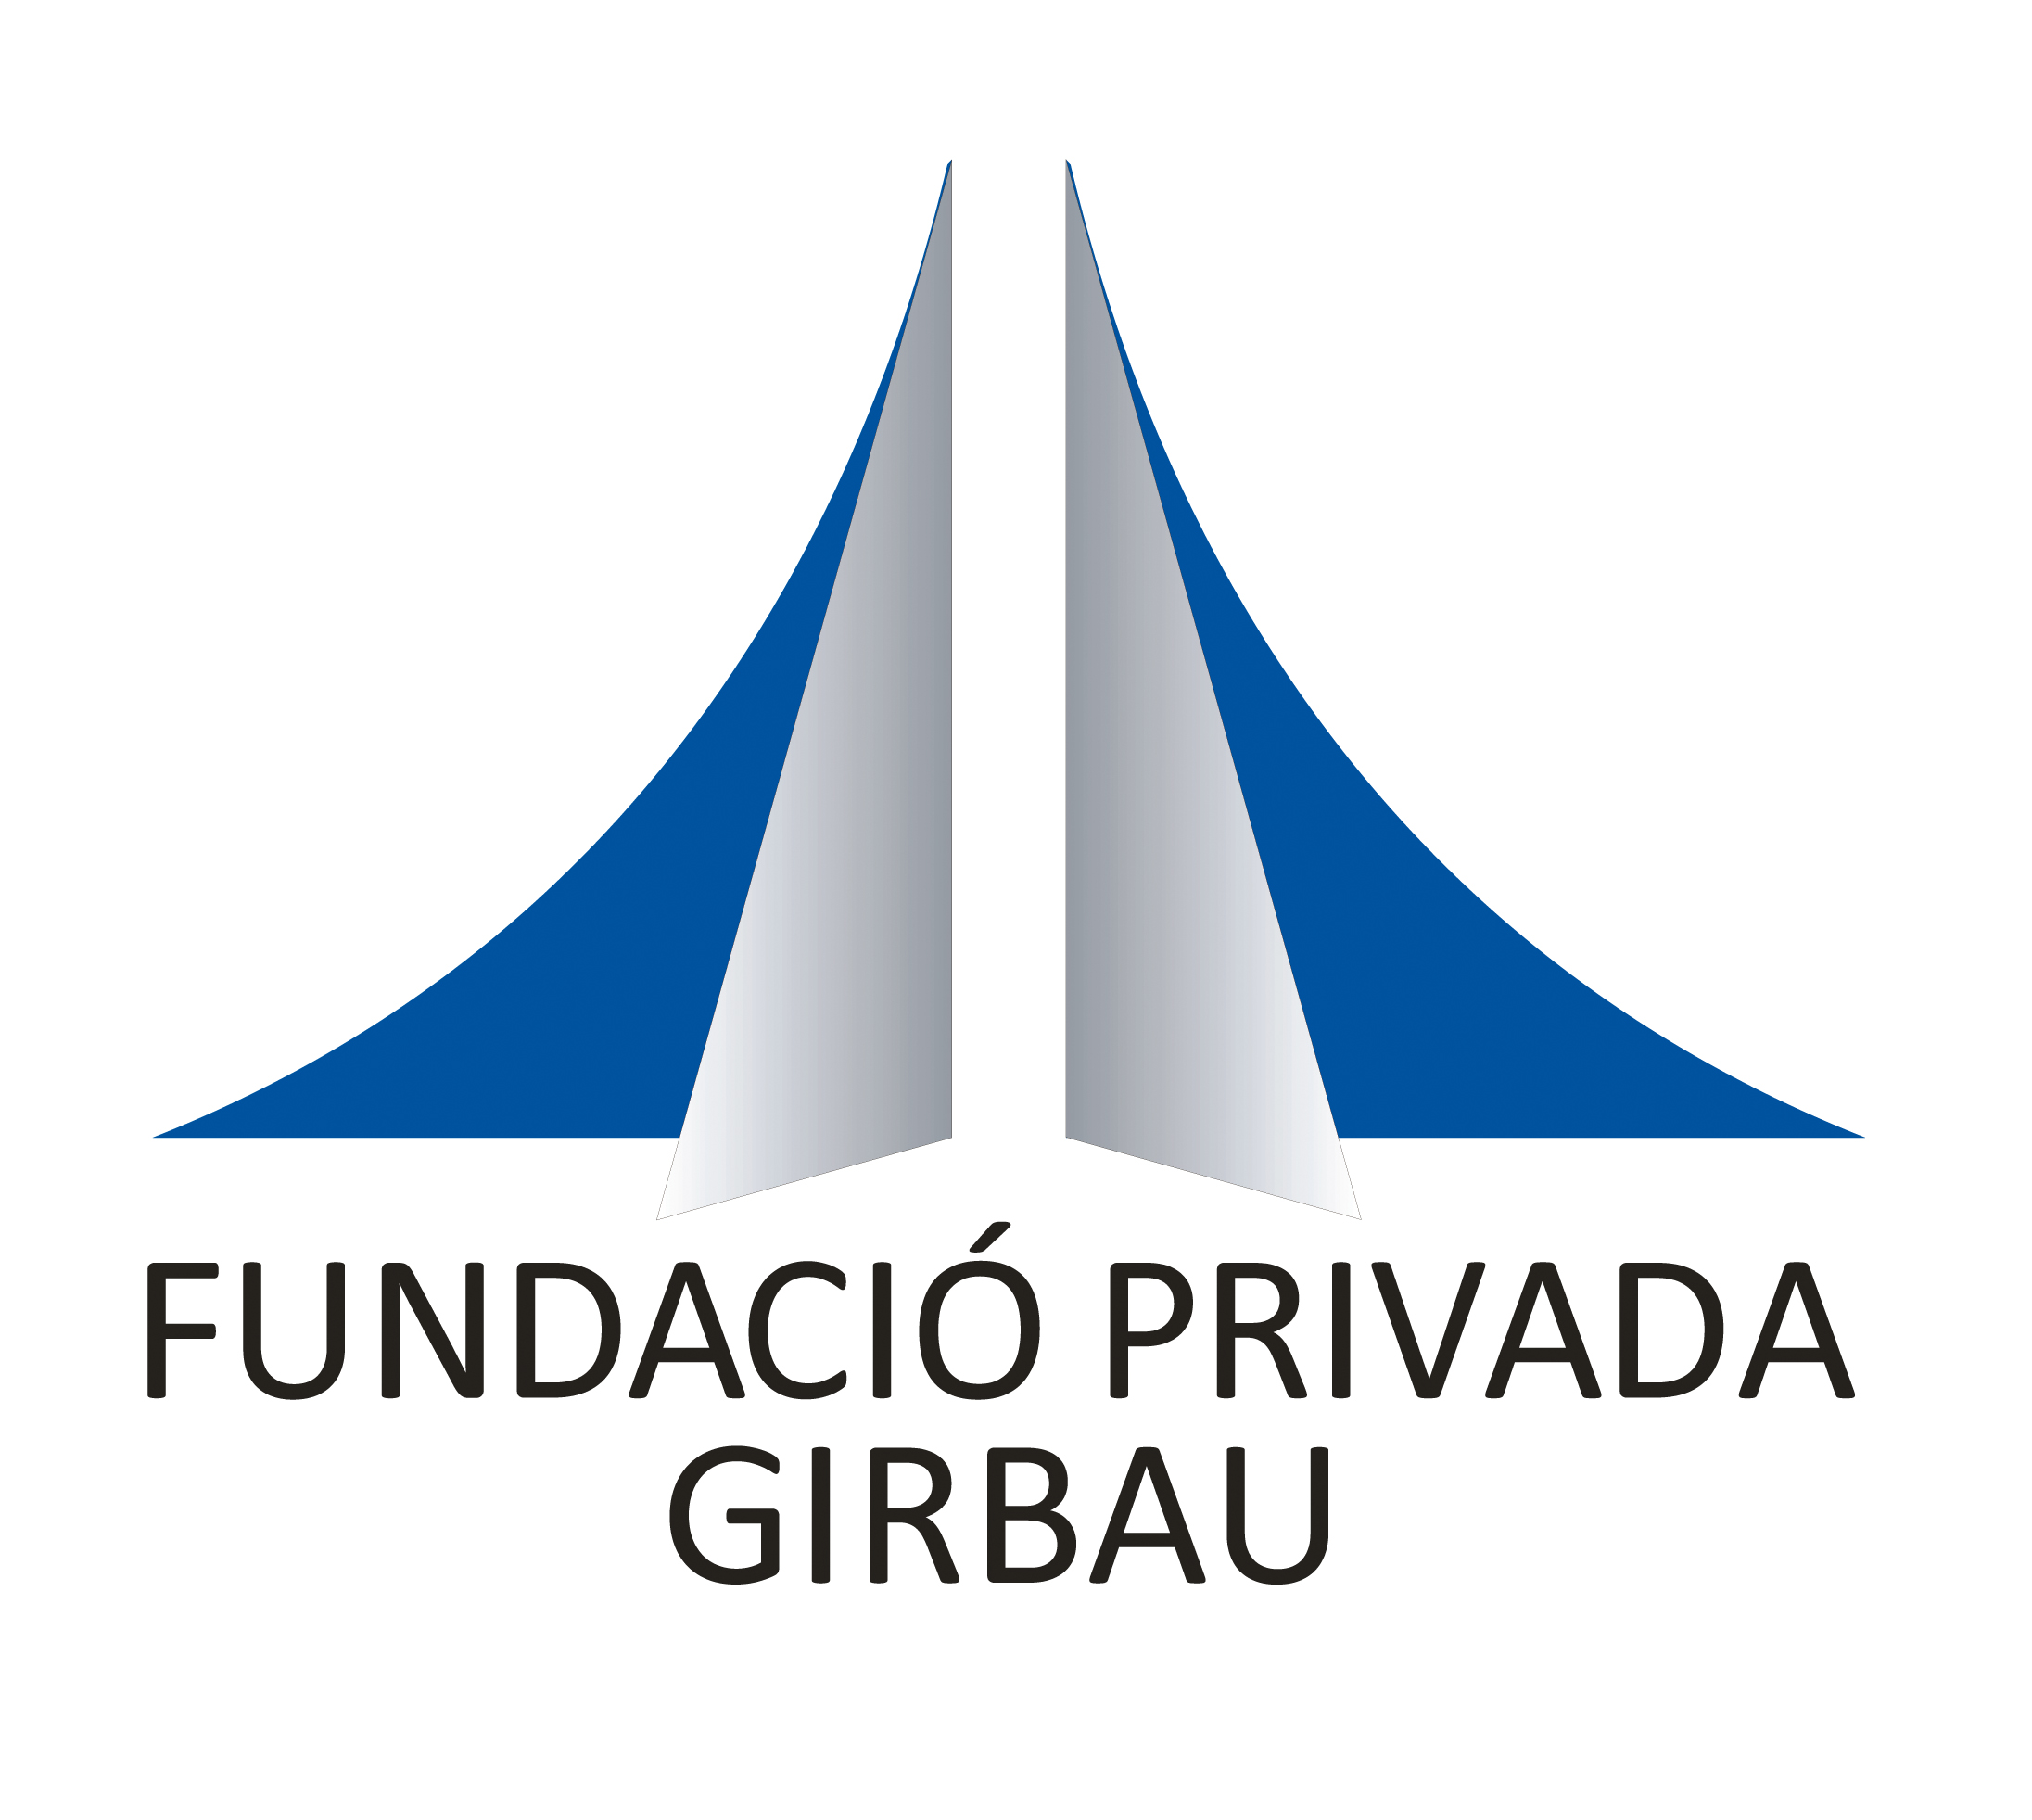 Fundació Privada Girbau